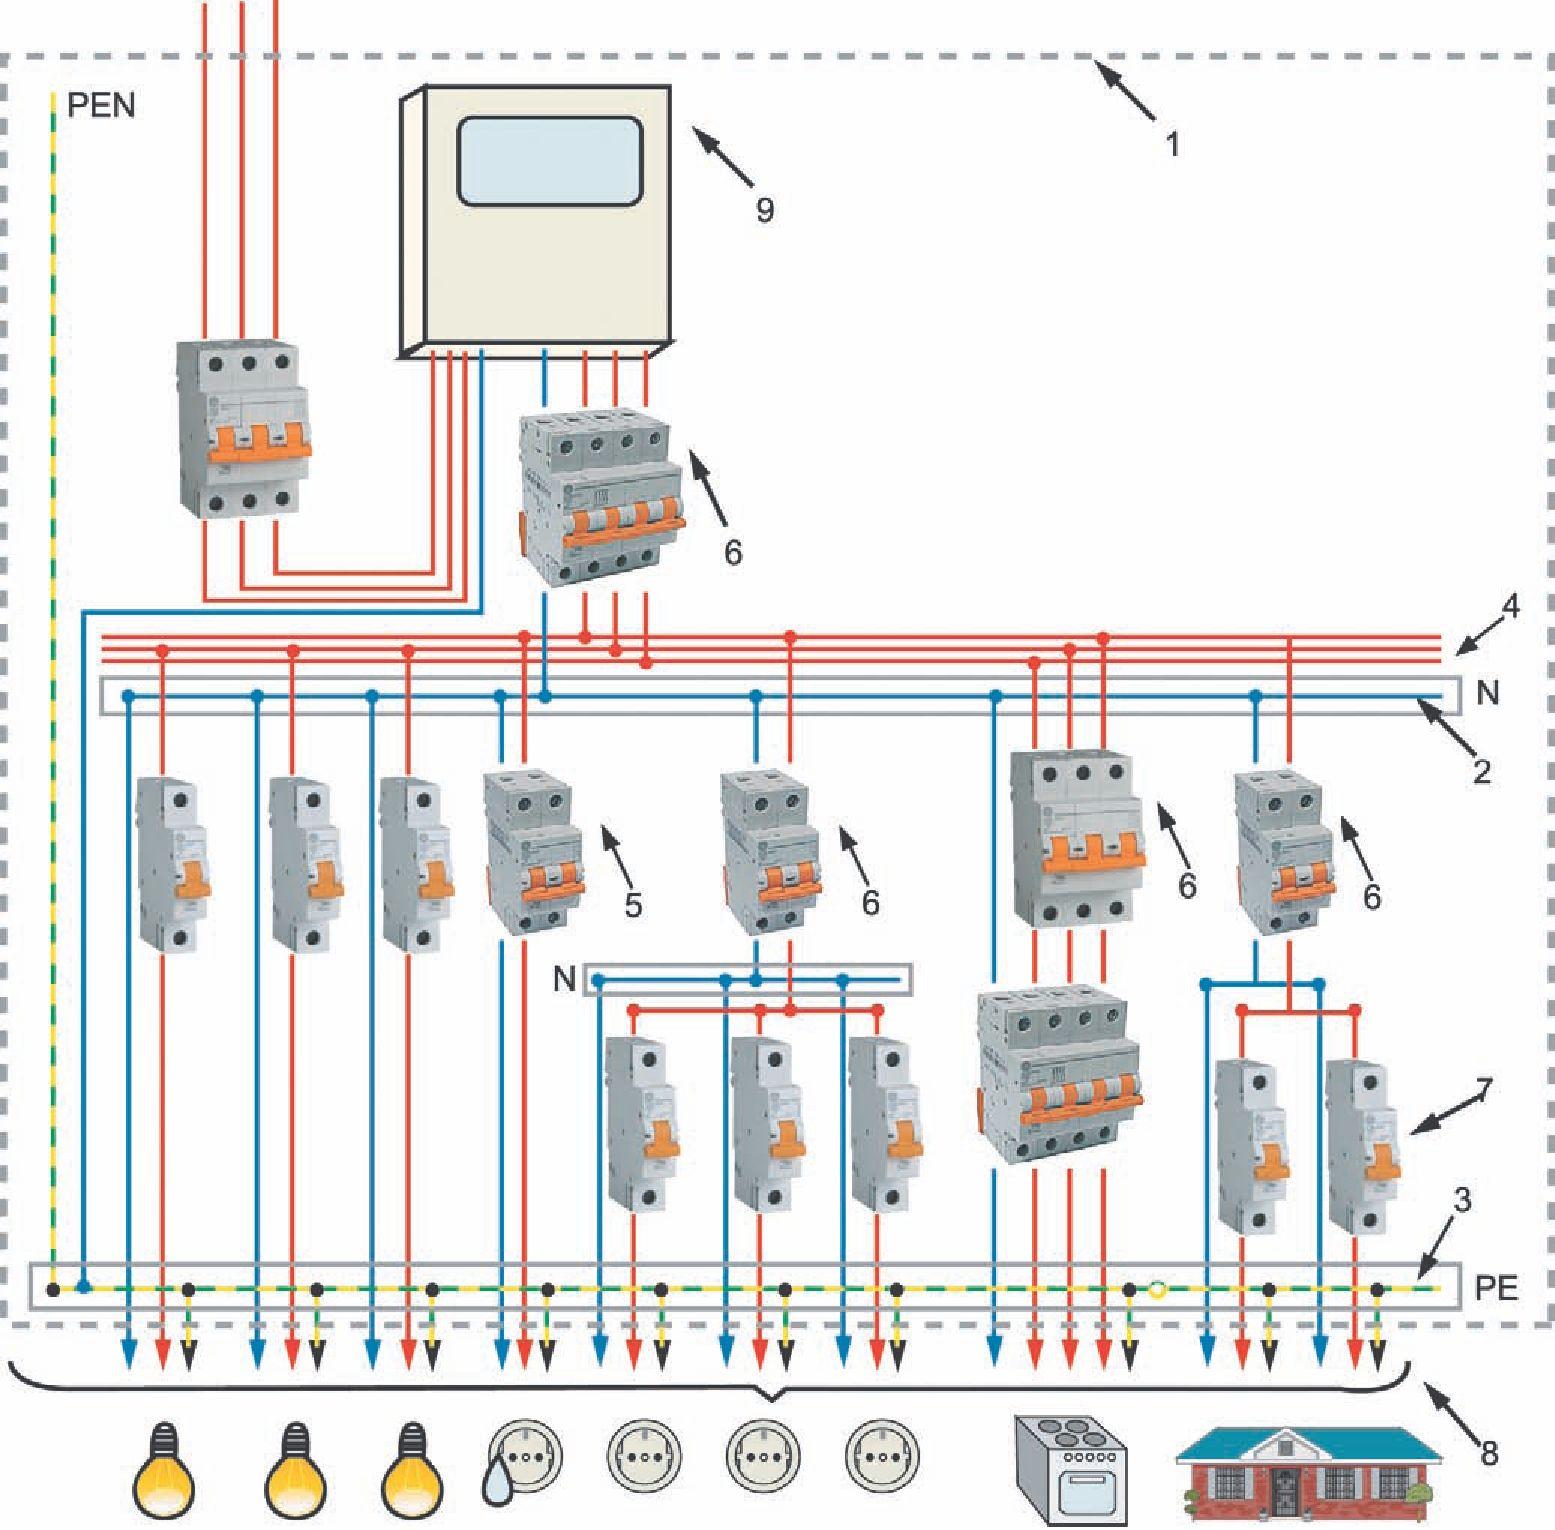 elektrichestvo-v-chastnom-dome-10